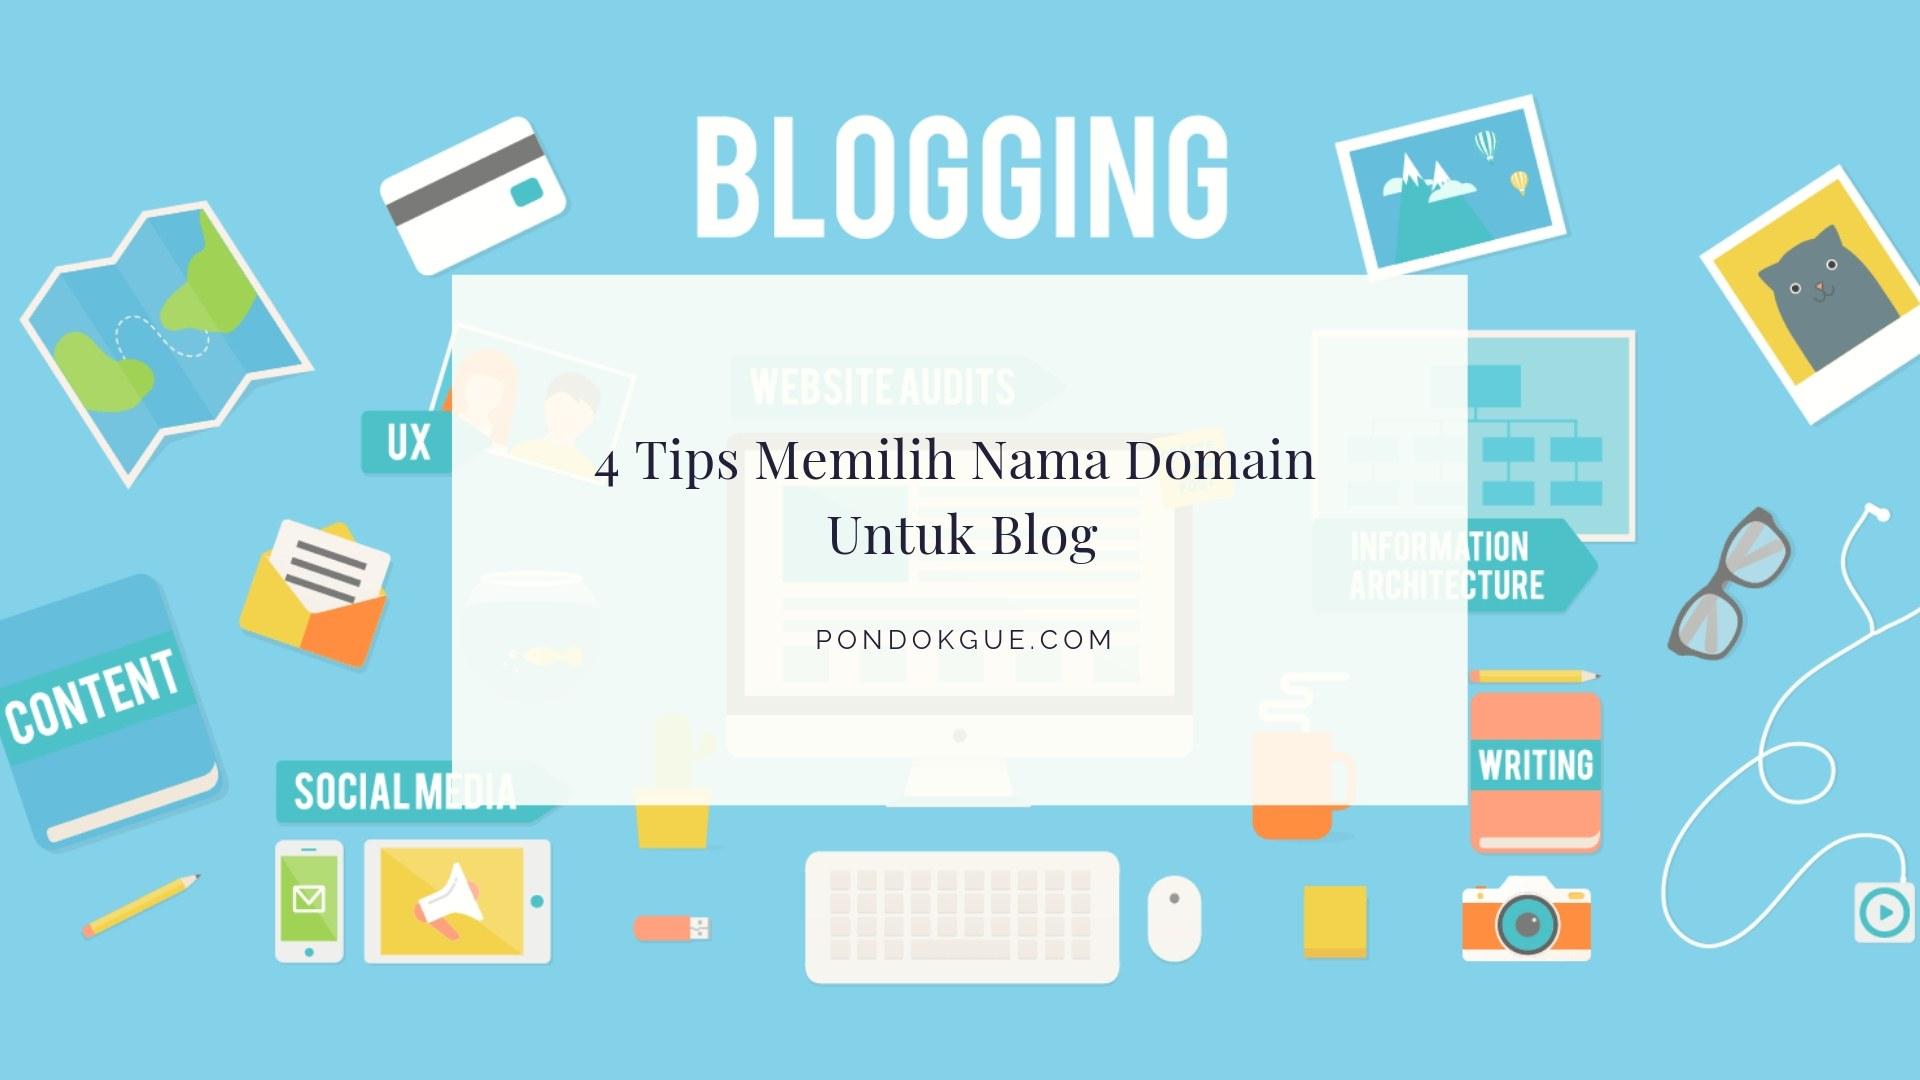 4 Tips Memilih Nama Domain Untuk Blog